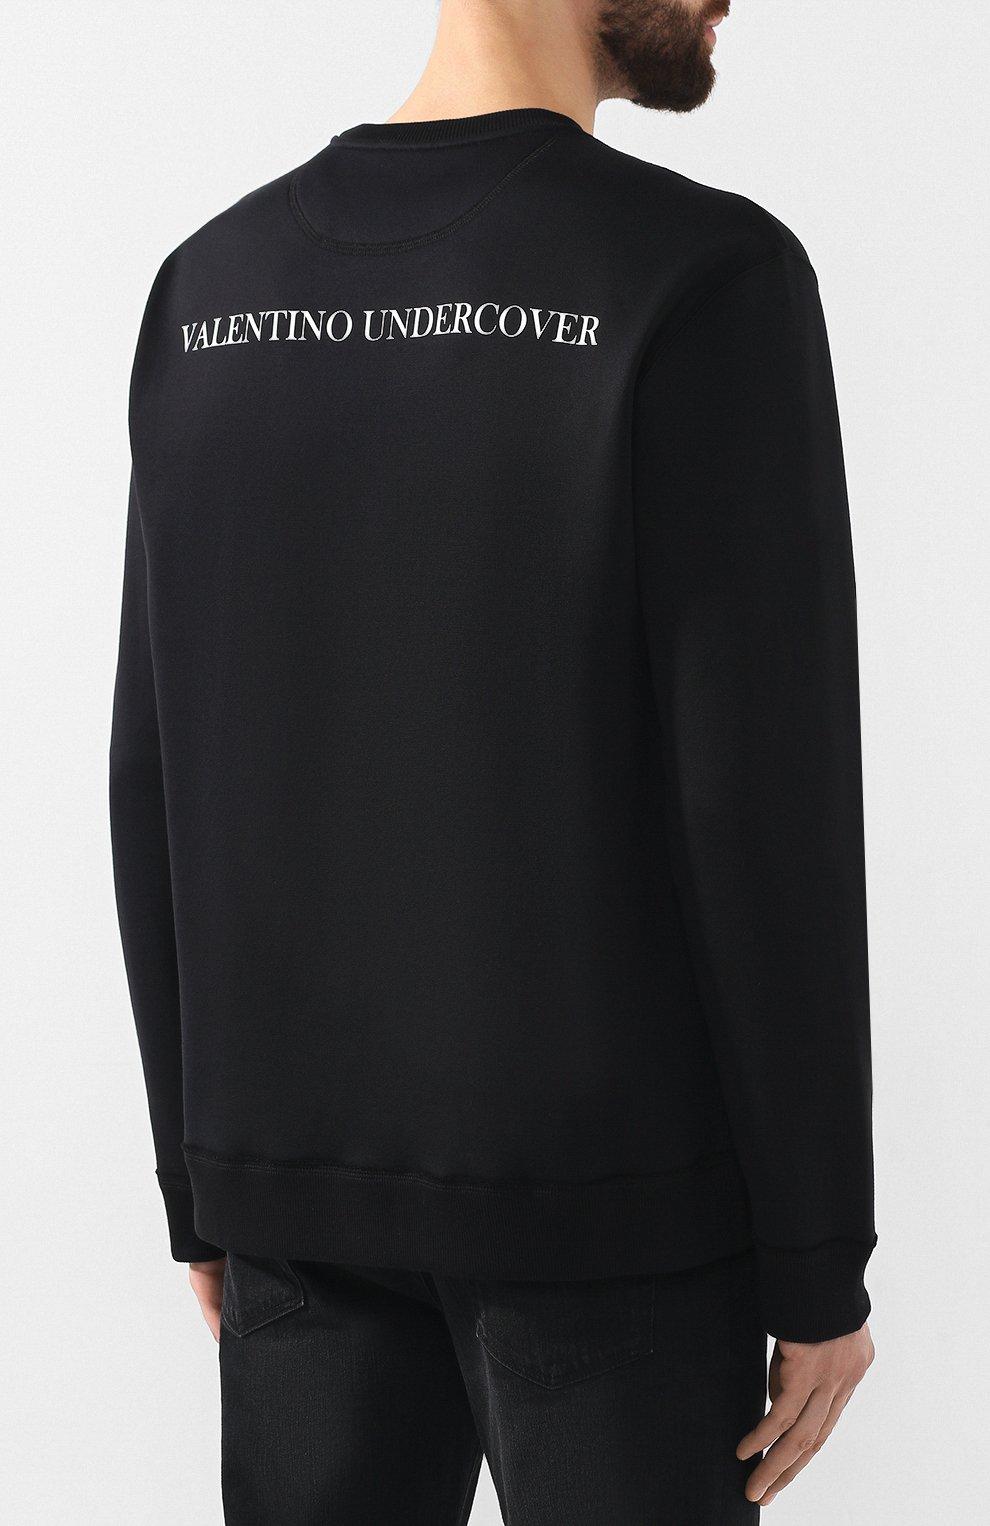 Хлопковый свитшот Valentino x Undercover | Фото №4